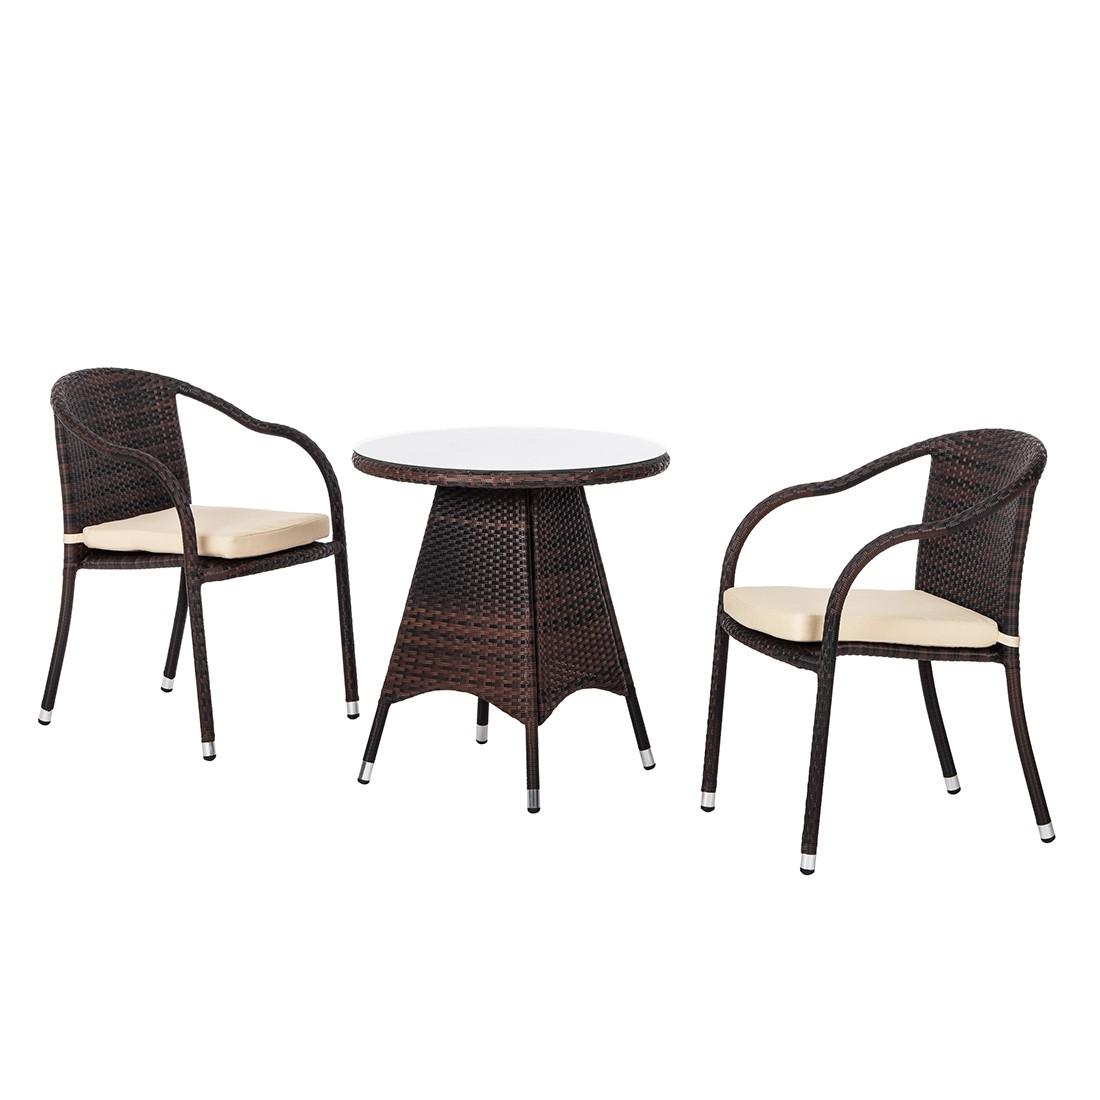 Bistroset Paradise Lounge I (3-teilig) - Polyrattan Braun, Kings Garden